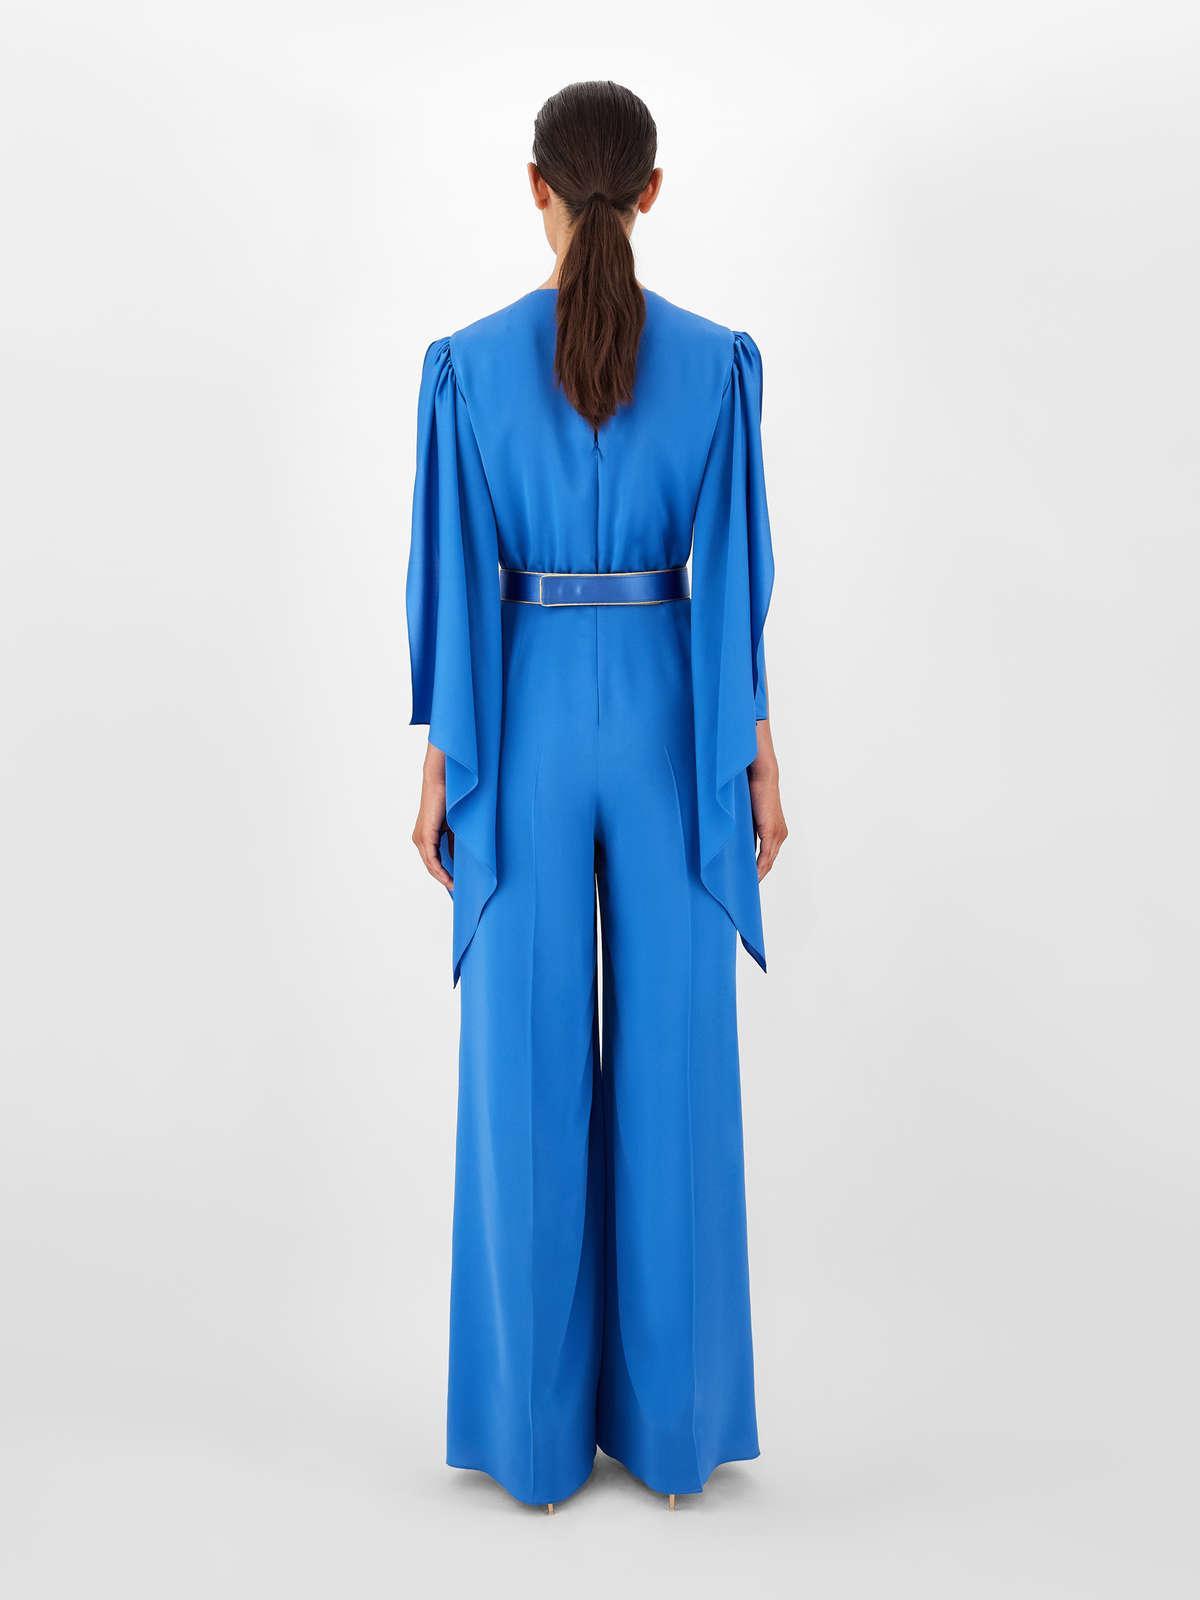 Womens Max Mara Jumpsuits | Silk Charmeuse Jumpsuit Cornflower Blue